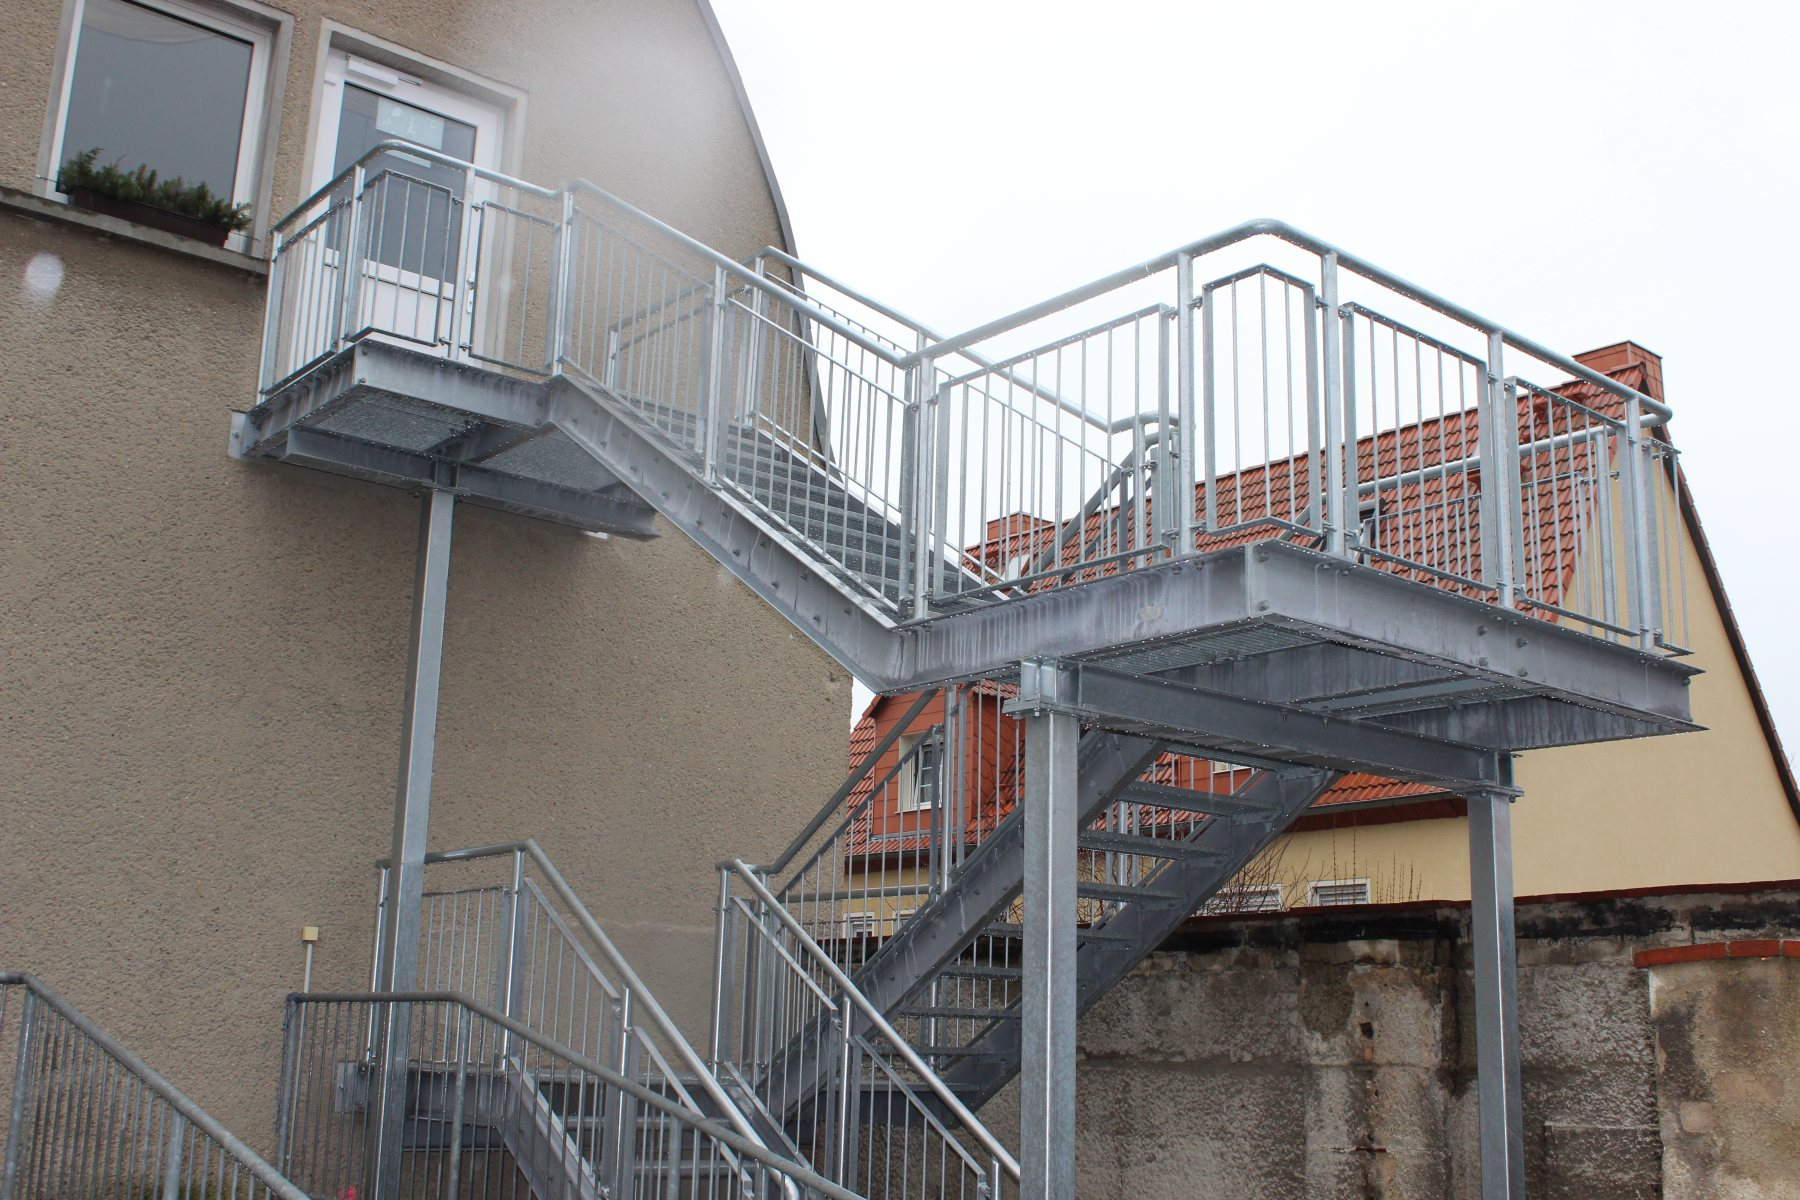 Metallbau Rödiger Stahlbau Leuna Montage Brückenbau